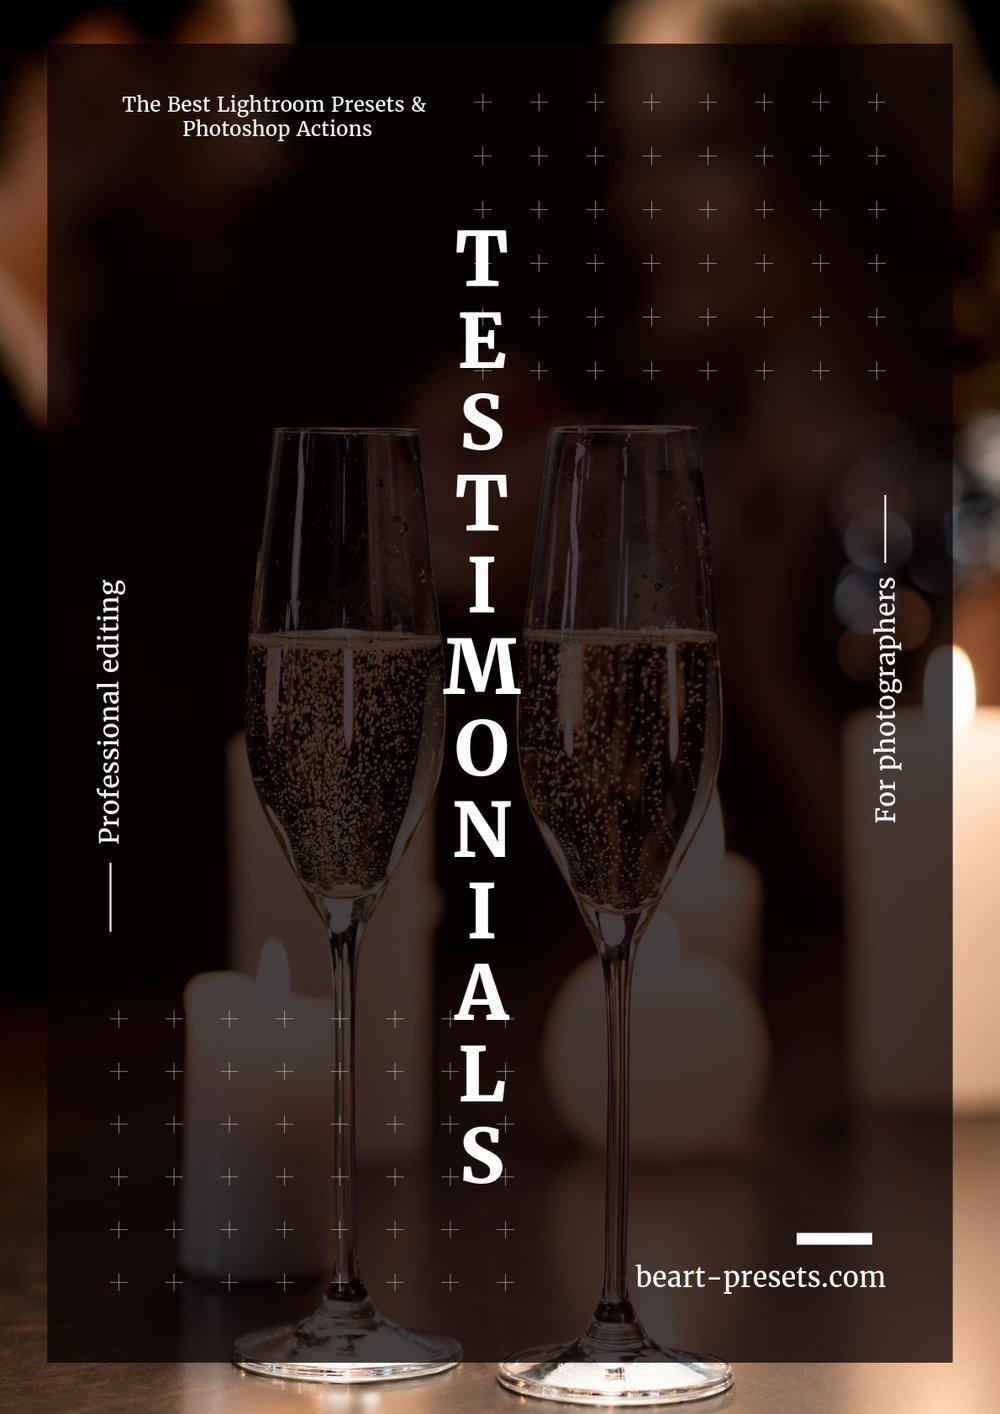 TESTIMONIALS by beart-presets